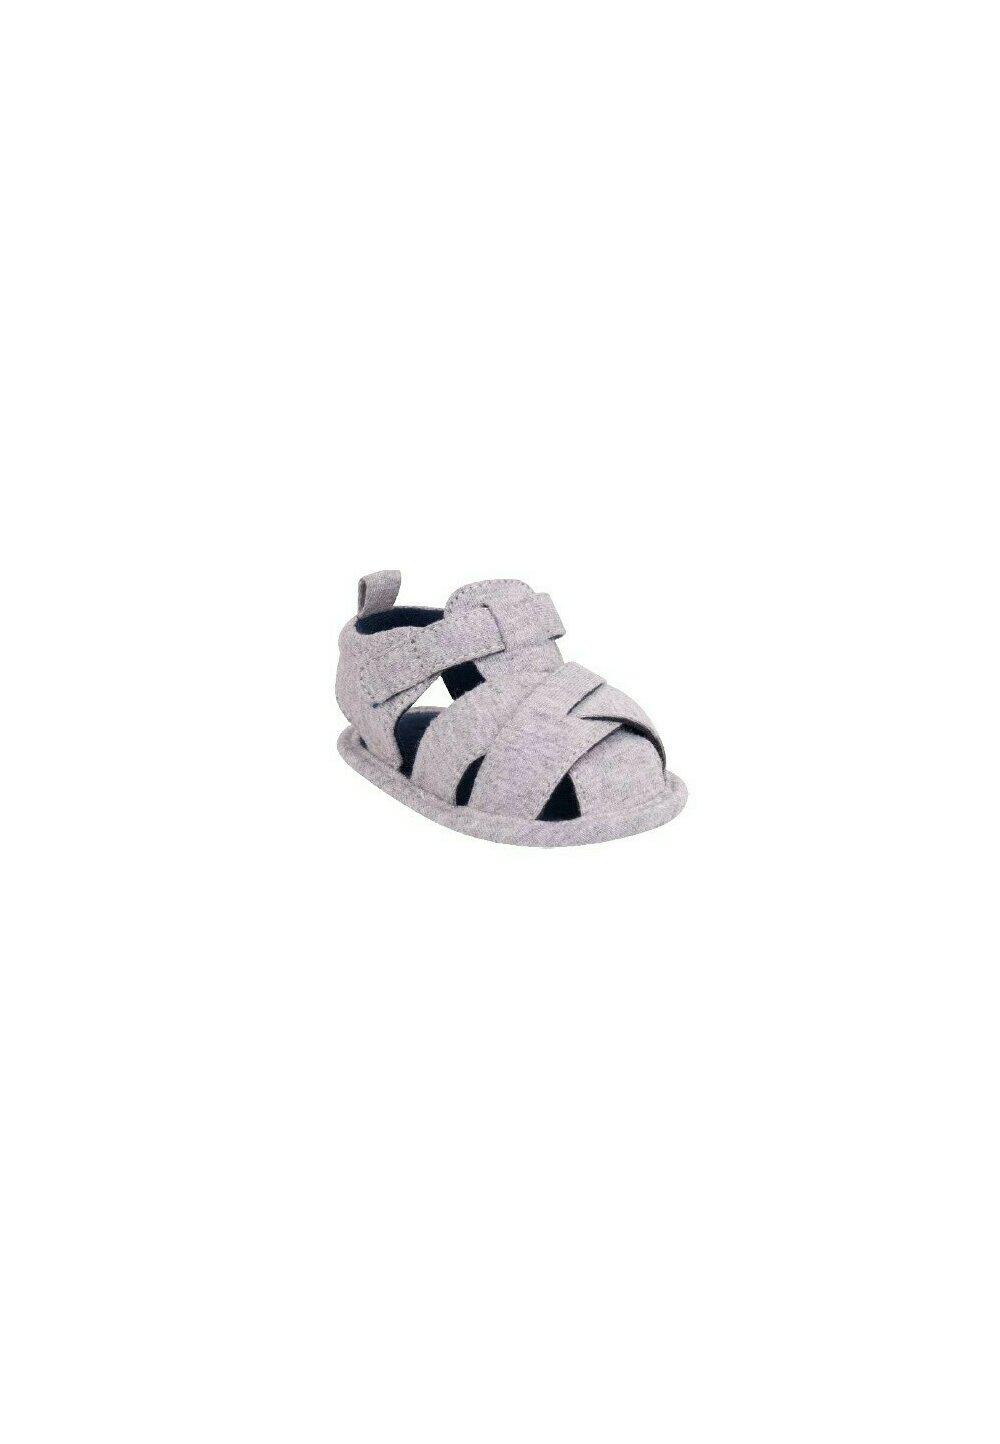 Sandale bebe, gri imagine